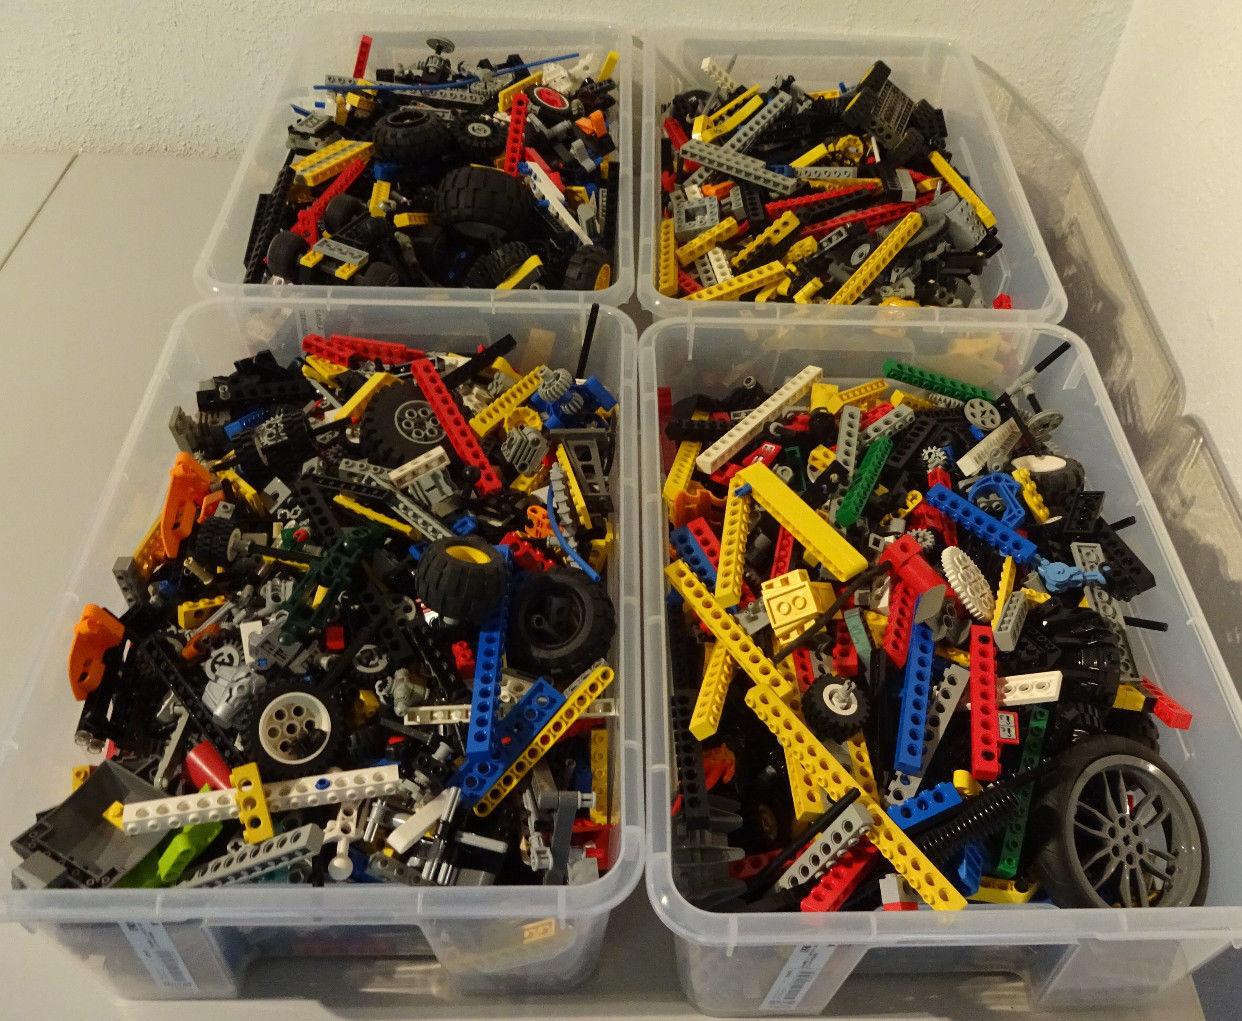 (Hk) Lego Technic Technology 1 kg Connector Wheels Lochsteine Kilo Goods Mixed